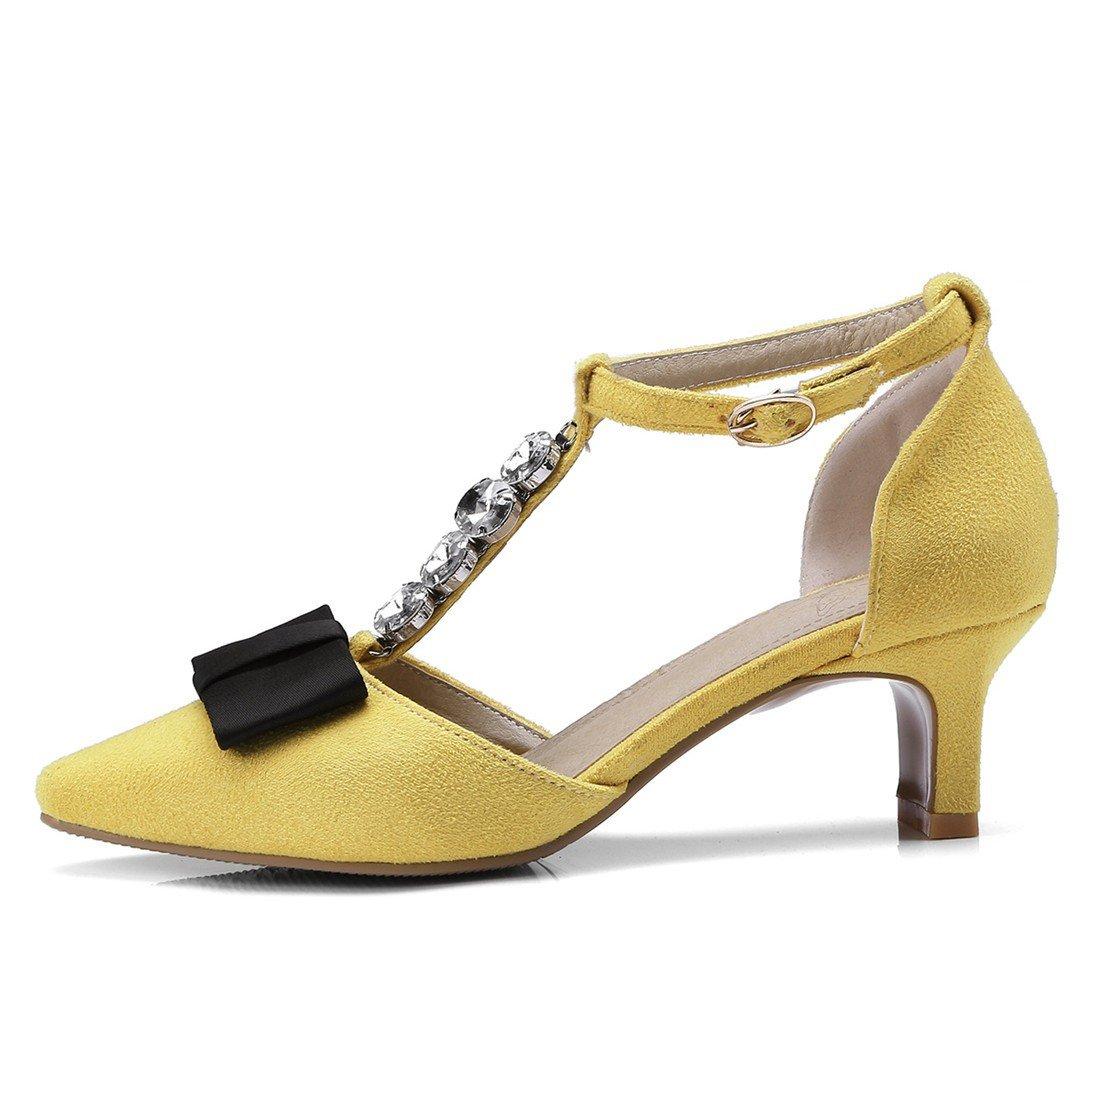 Mesdames Les Sandales, B001949G88 yellow Noeud Papillon, Sandales, Sandales, Diamond Sandales, des Sandales, des Sandales, des Sandales et des Sandales. yellow b536cc2 - boatplans.space